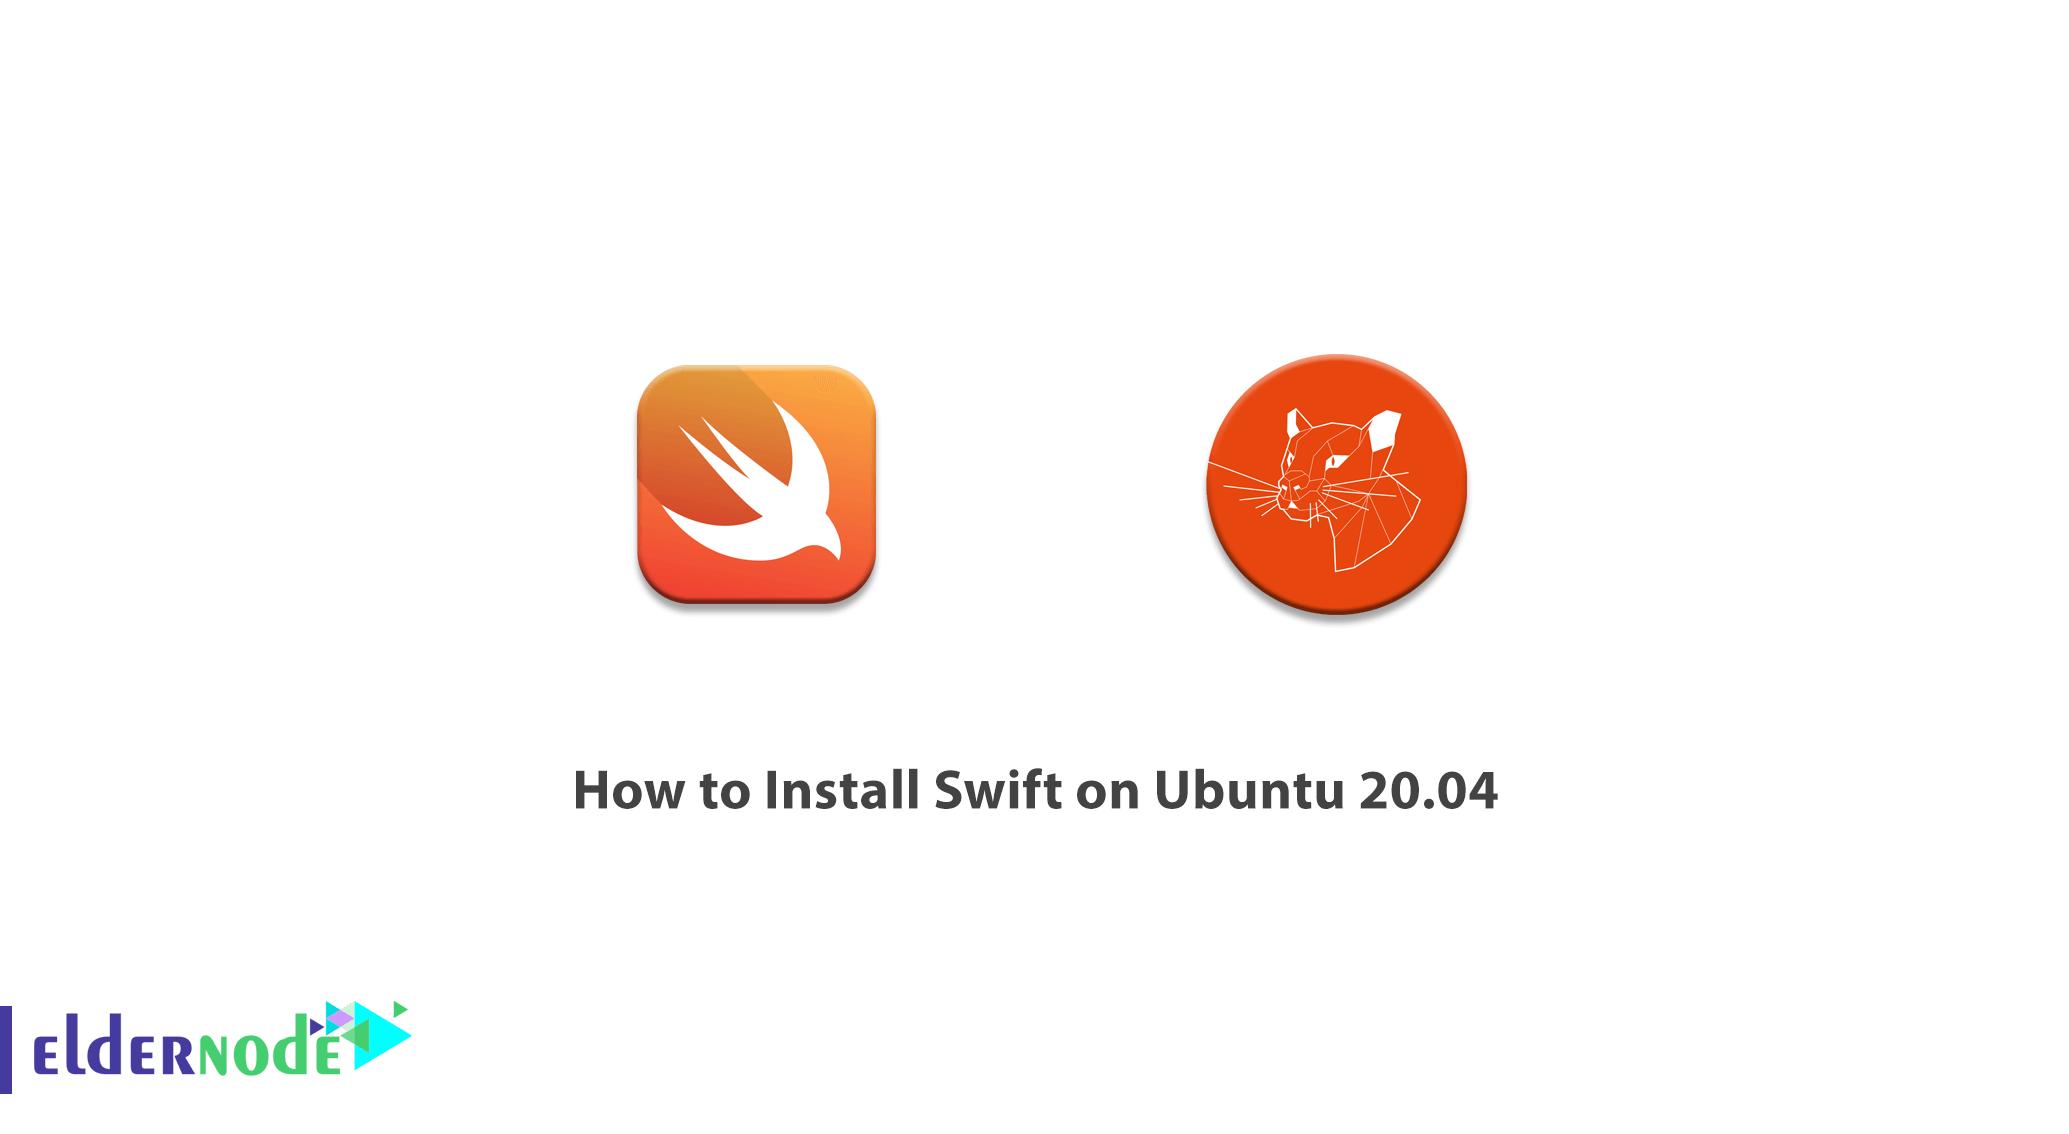 How to Install Swift on Ubuntu 20.04